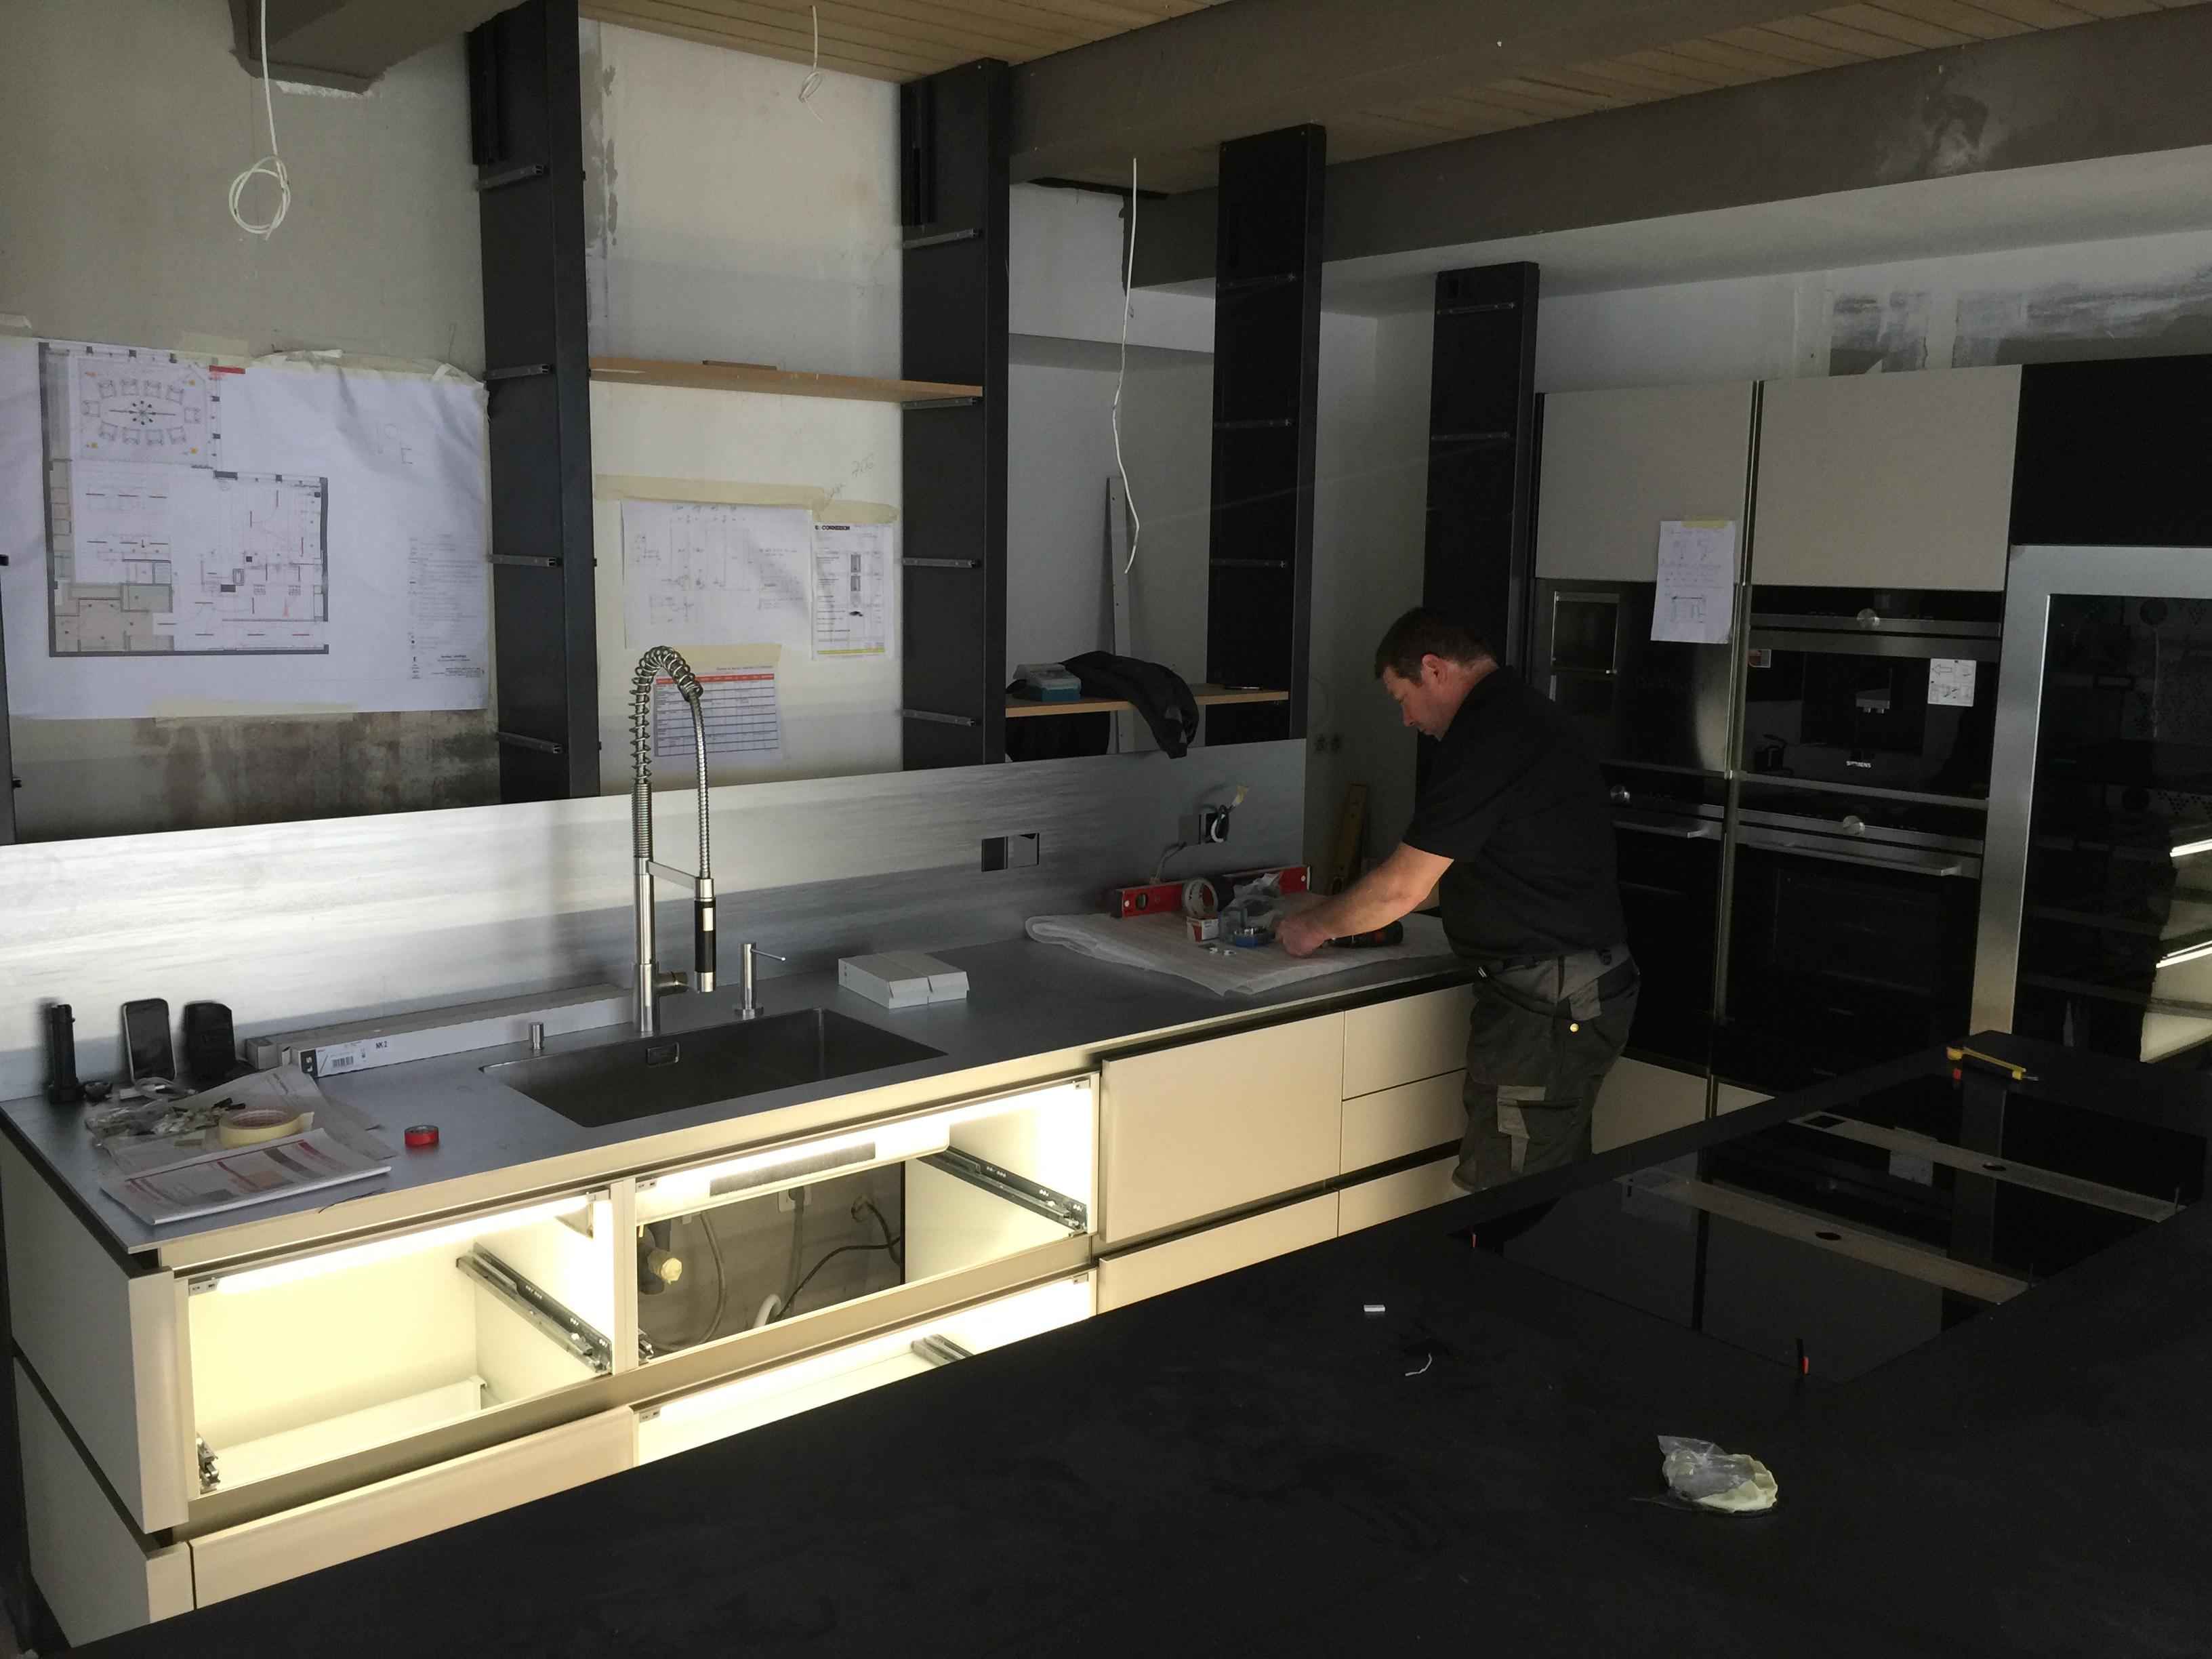 La cuisine de norbert tarayre veneta cucine l for Agencement cuisine yverdon